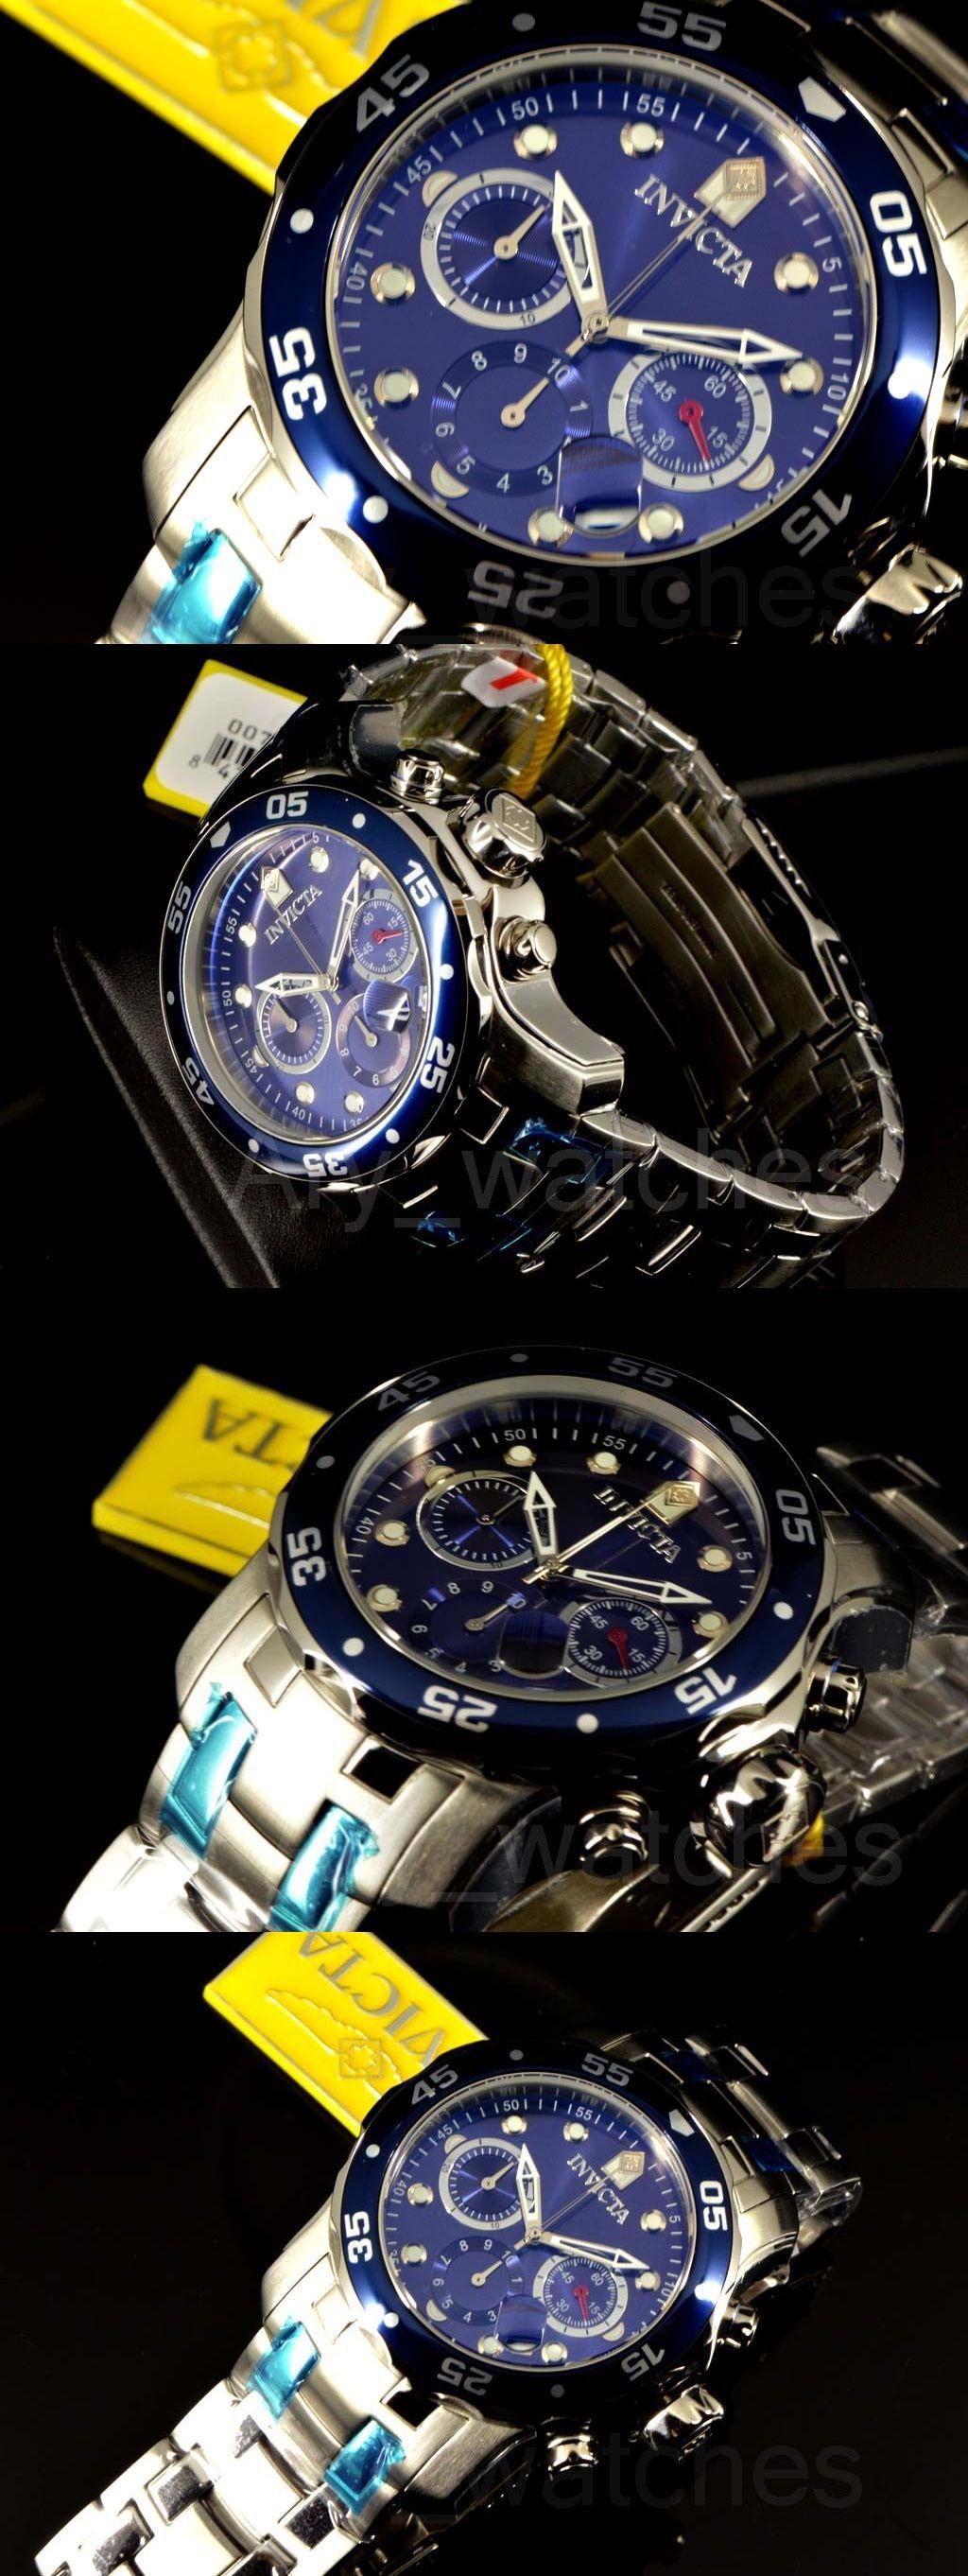 Wristwatches 31387 Invicta Men S Pro Diver Scuba Blue Dial Swiss Mk3278 Chrono Steel Bracelet Watch